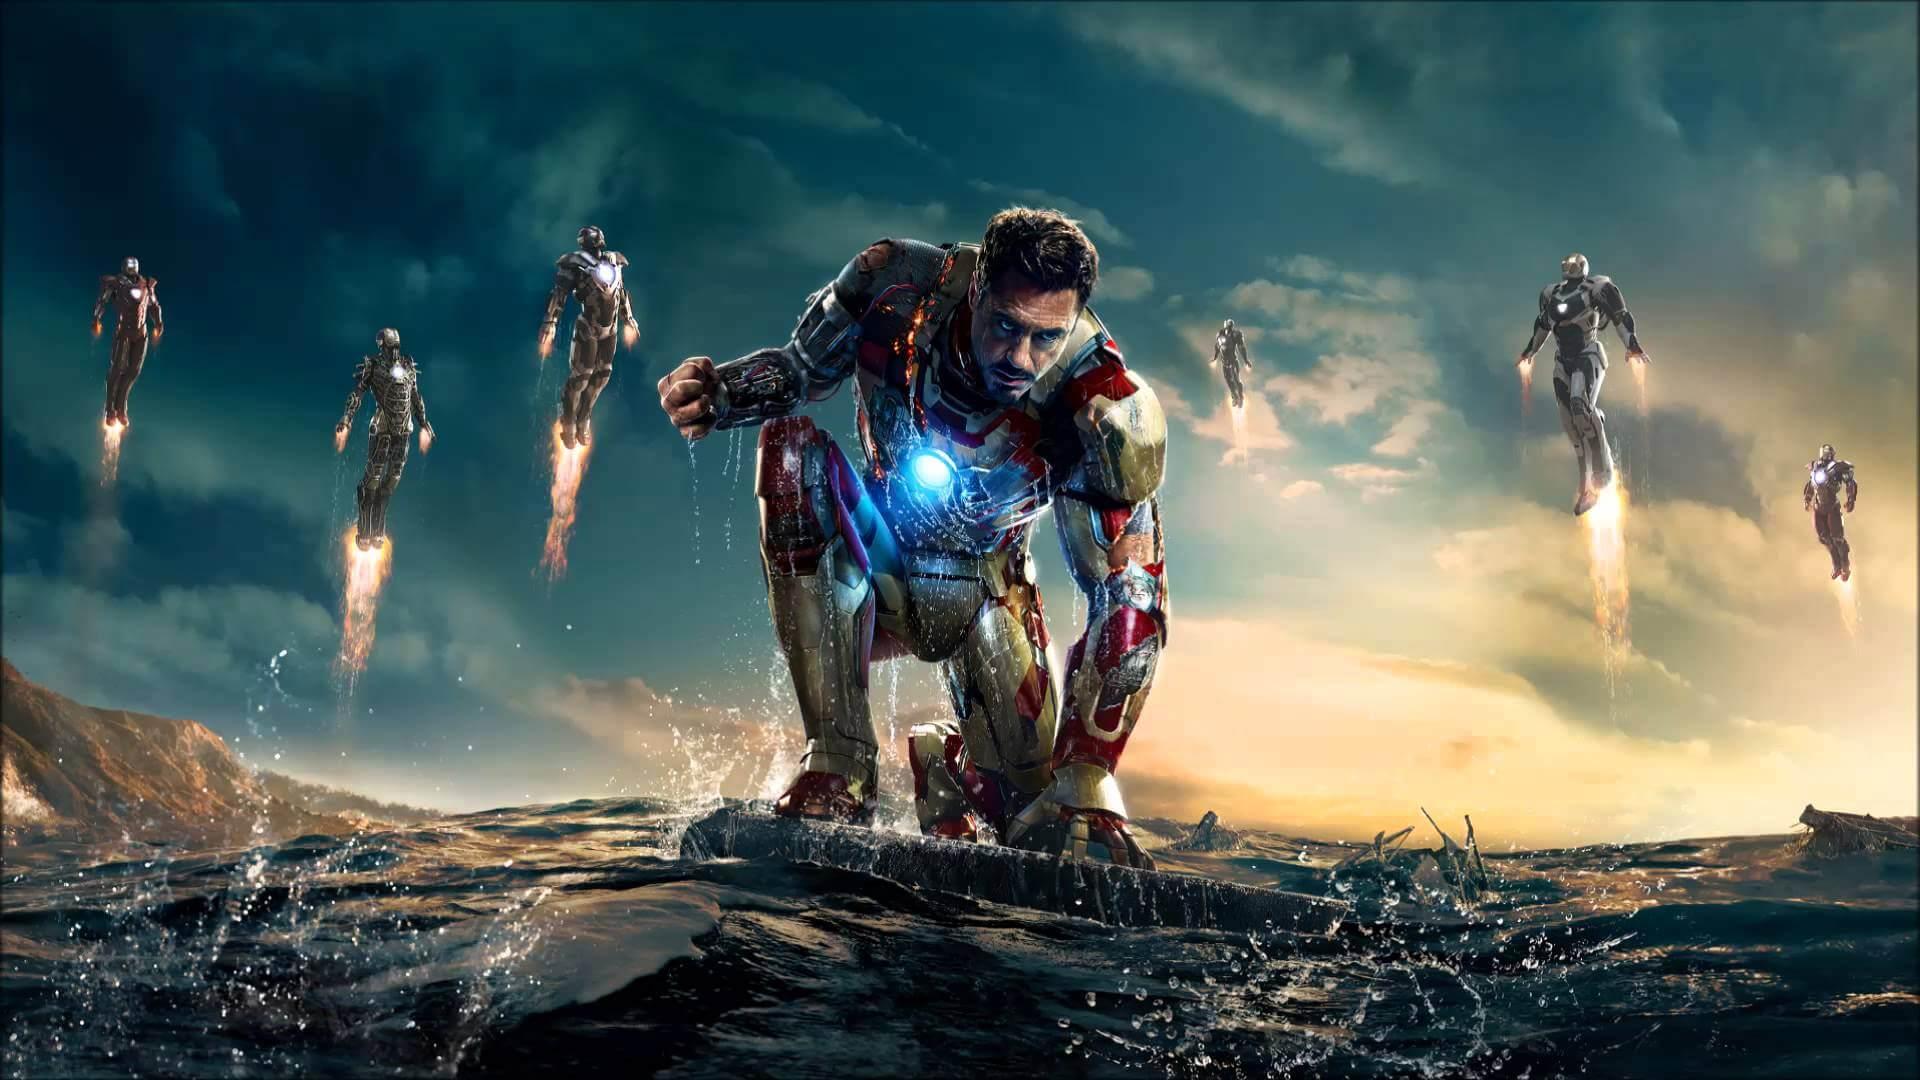 Fulfilling Robert Downey Jr's Contract